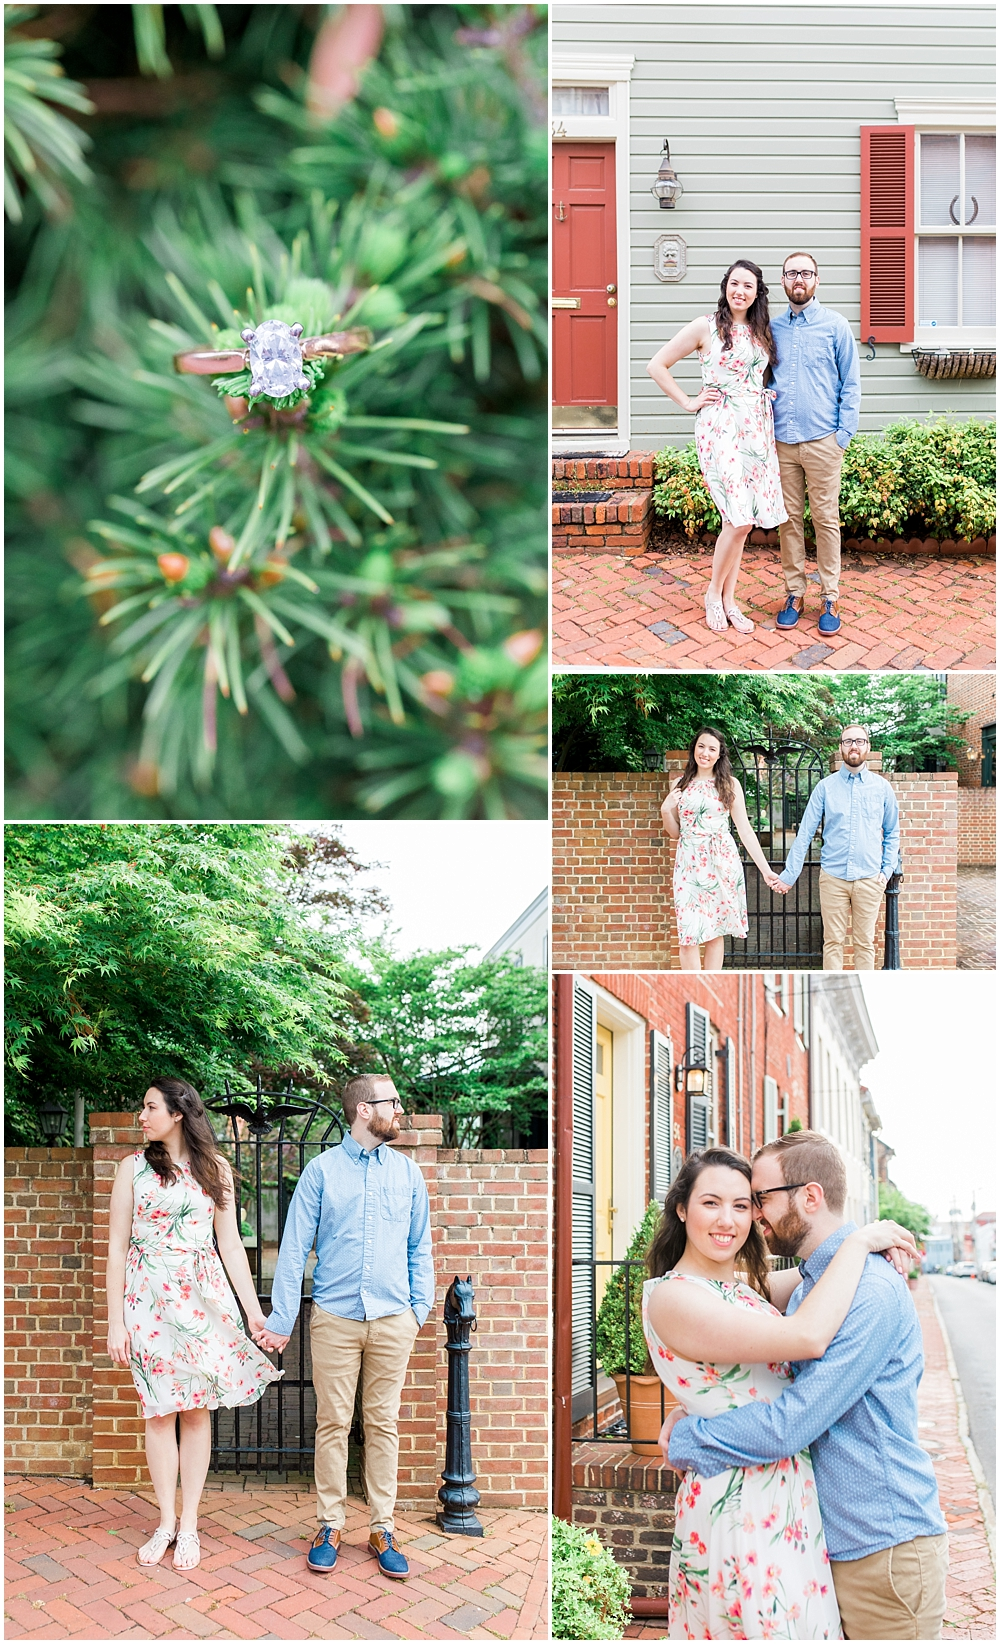 Downtown-Annapolis-Engagement-Photographer-Spring-1783-UP!-Disney-09-11_0004.jpg